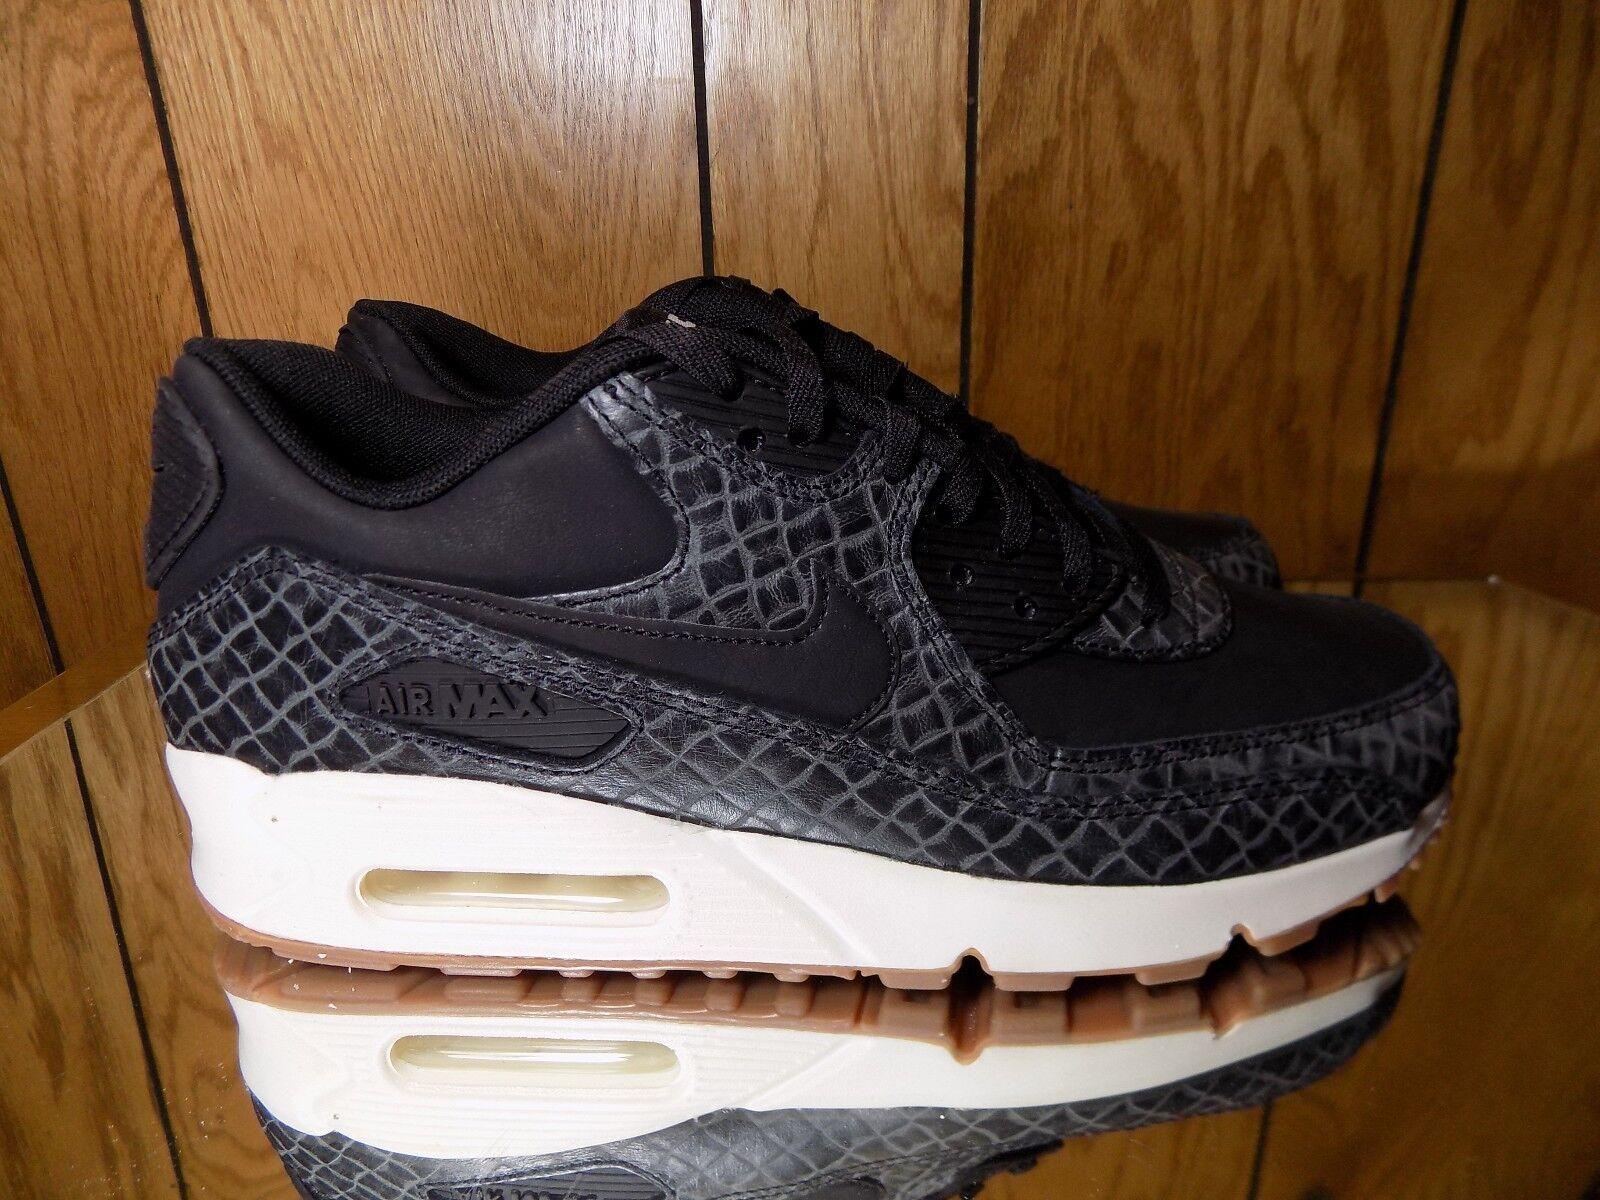 New Shoes Nike Women's Air Max 90 Premium Shoes New (443817-010) Black/Sail/Gum Med Brown 71aca1